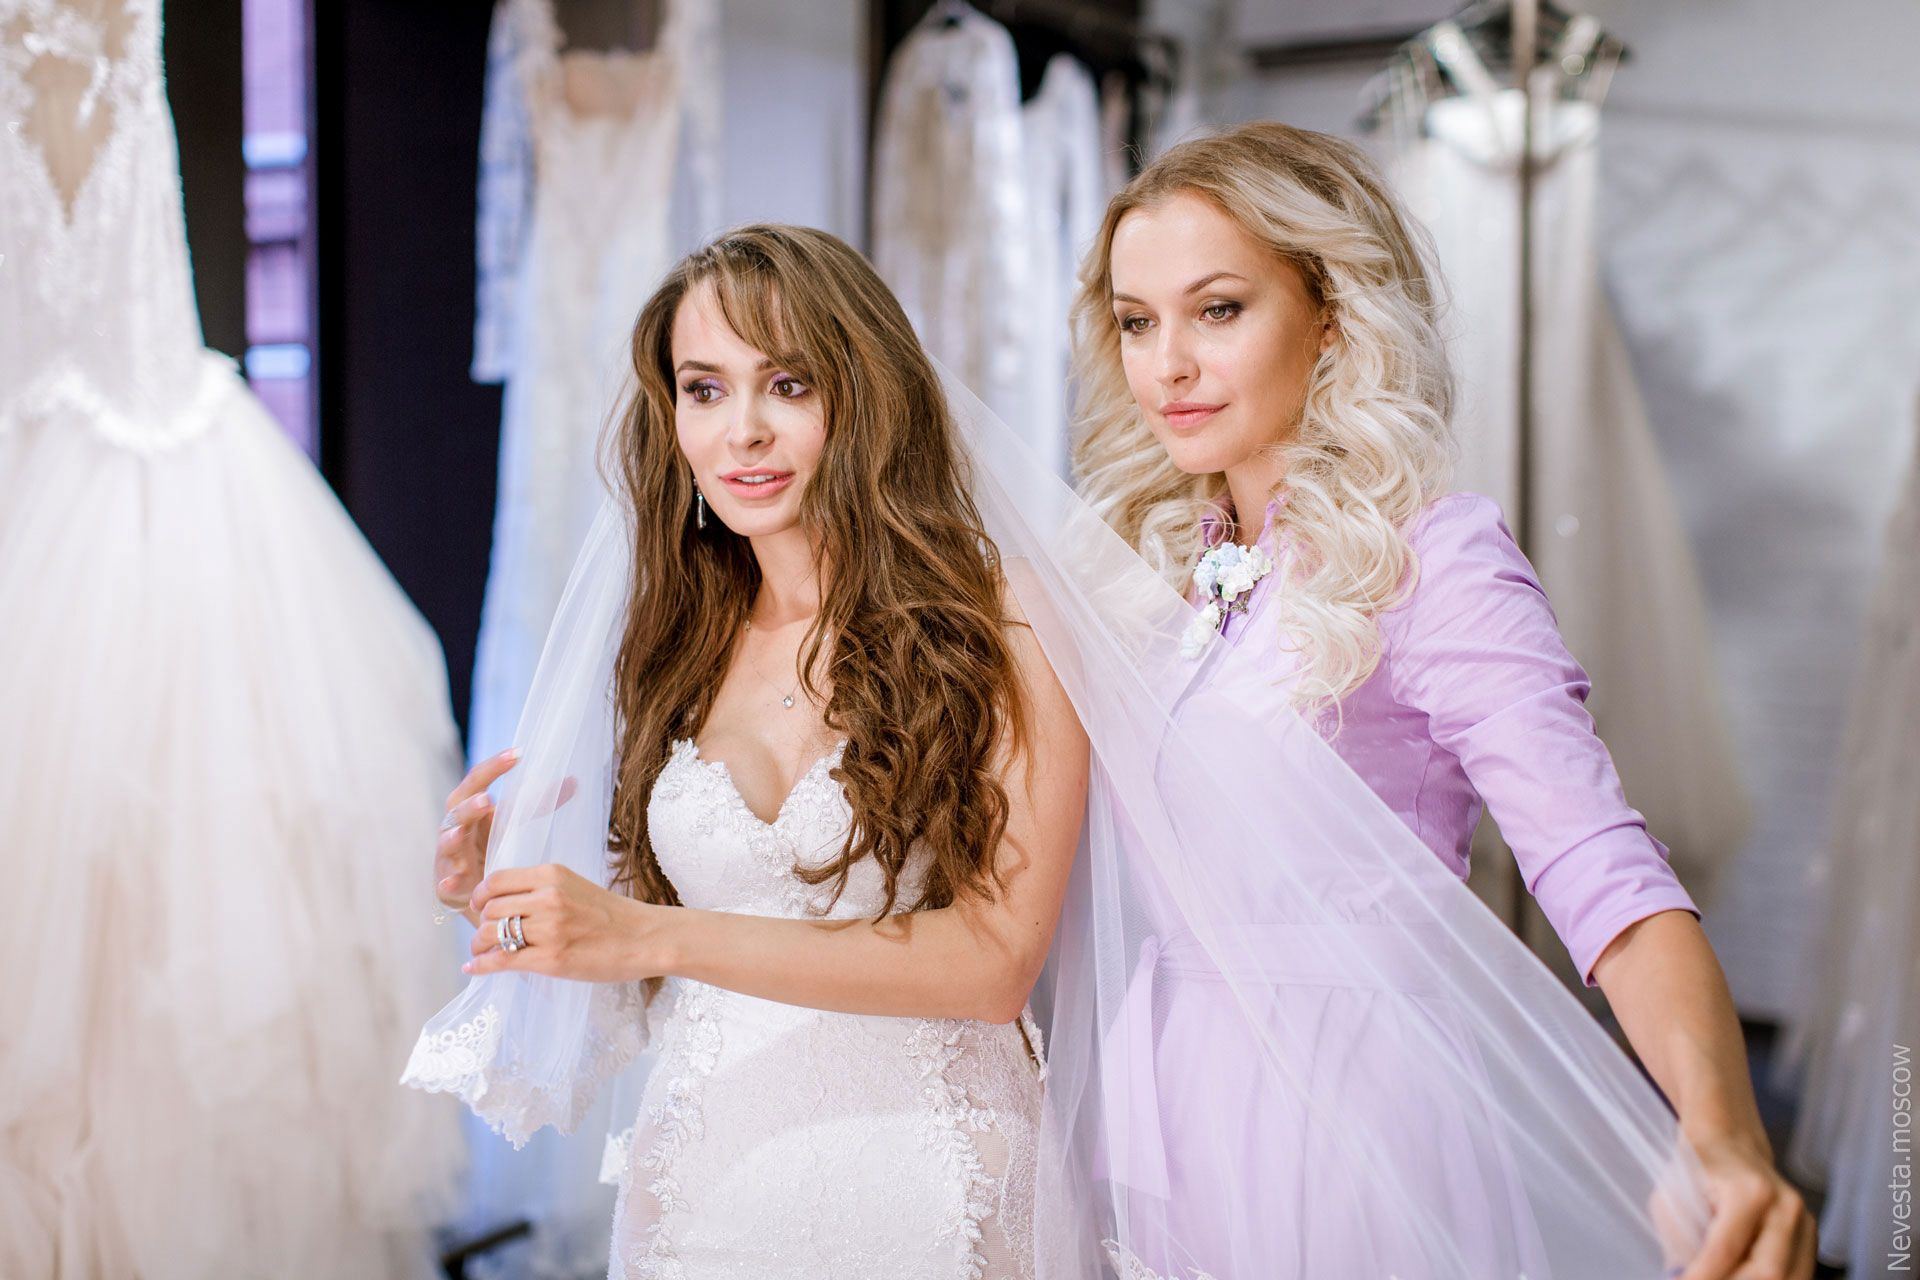 Актриса Анна Калашникова в образе белого лебедя фото 39